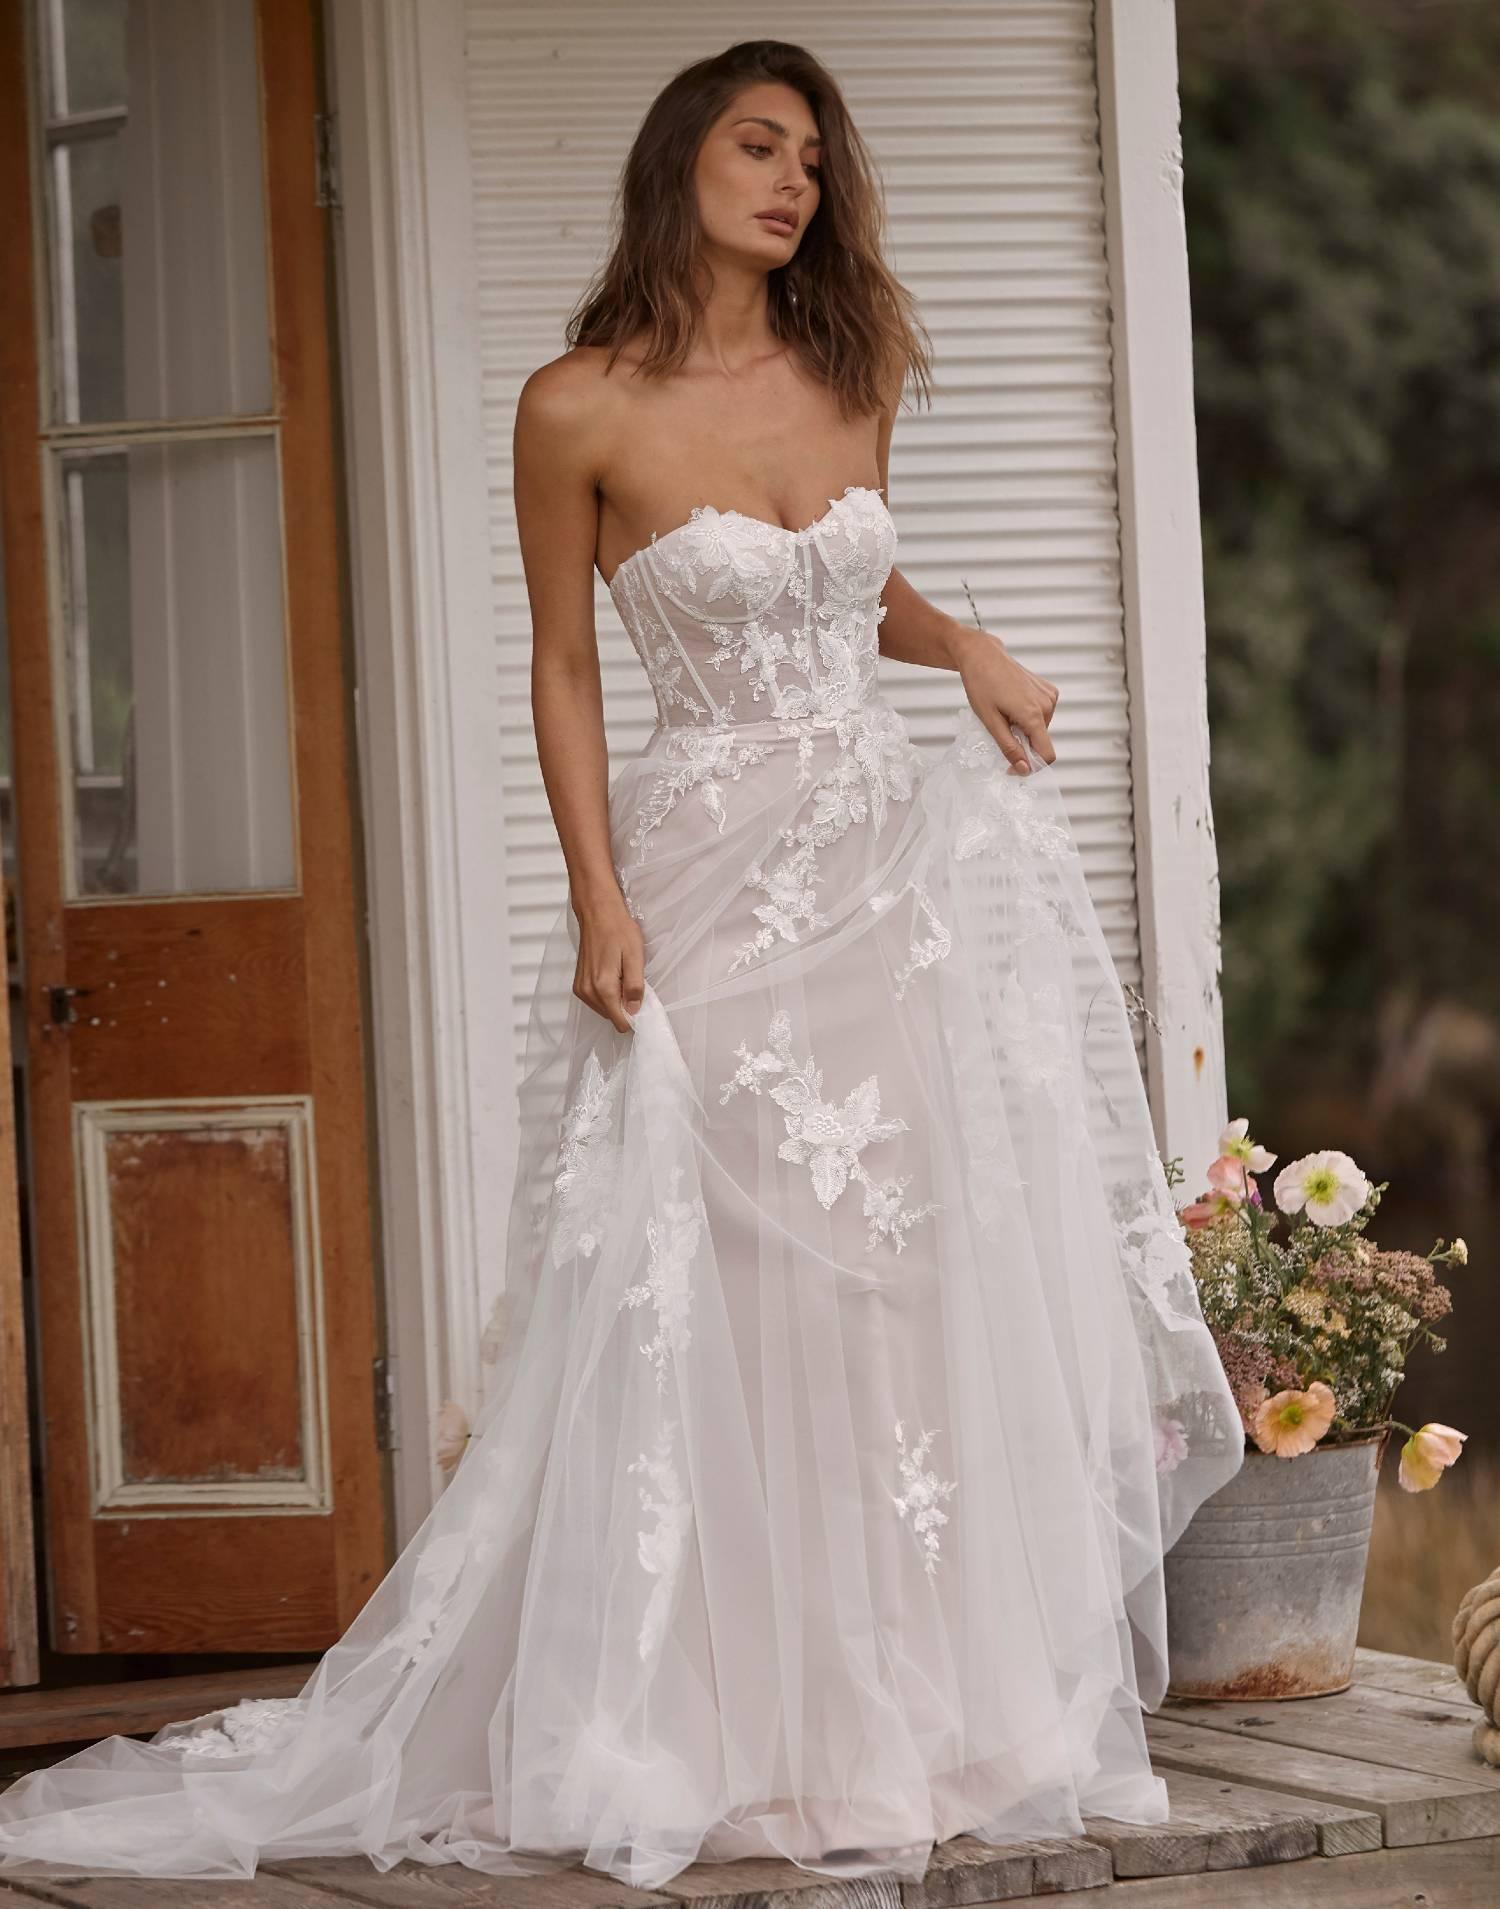 Callie – Madi Lane Wedding Dress Collection – Front View